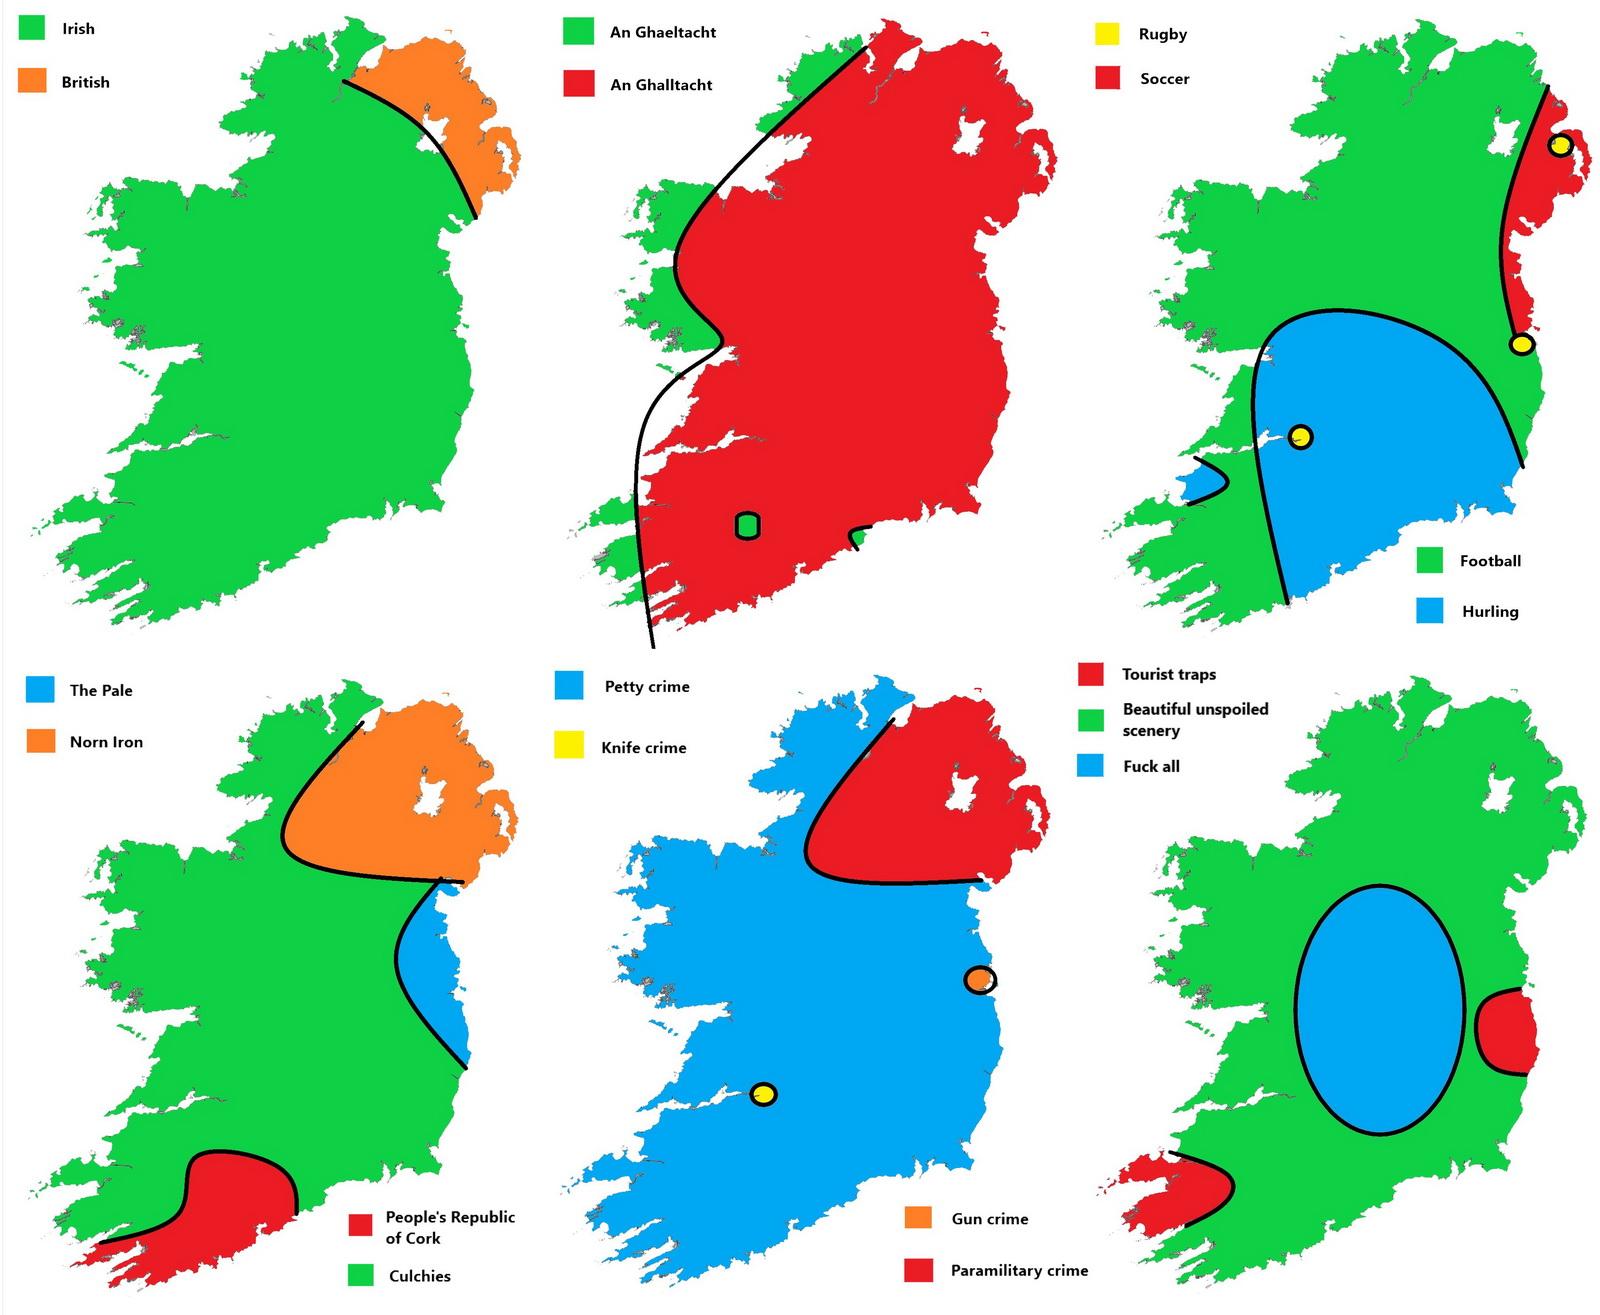 Tearing apart Ireland